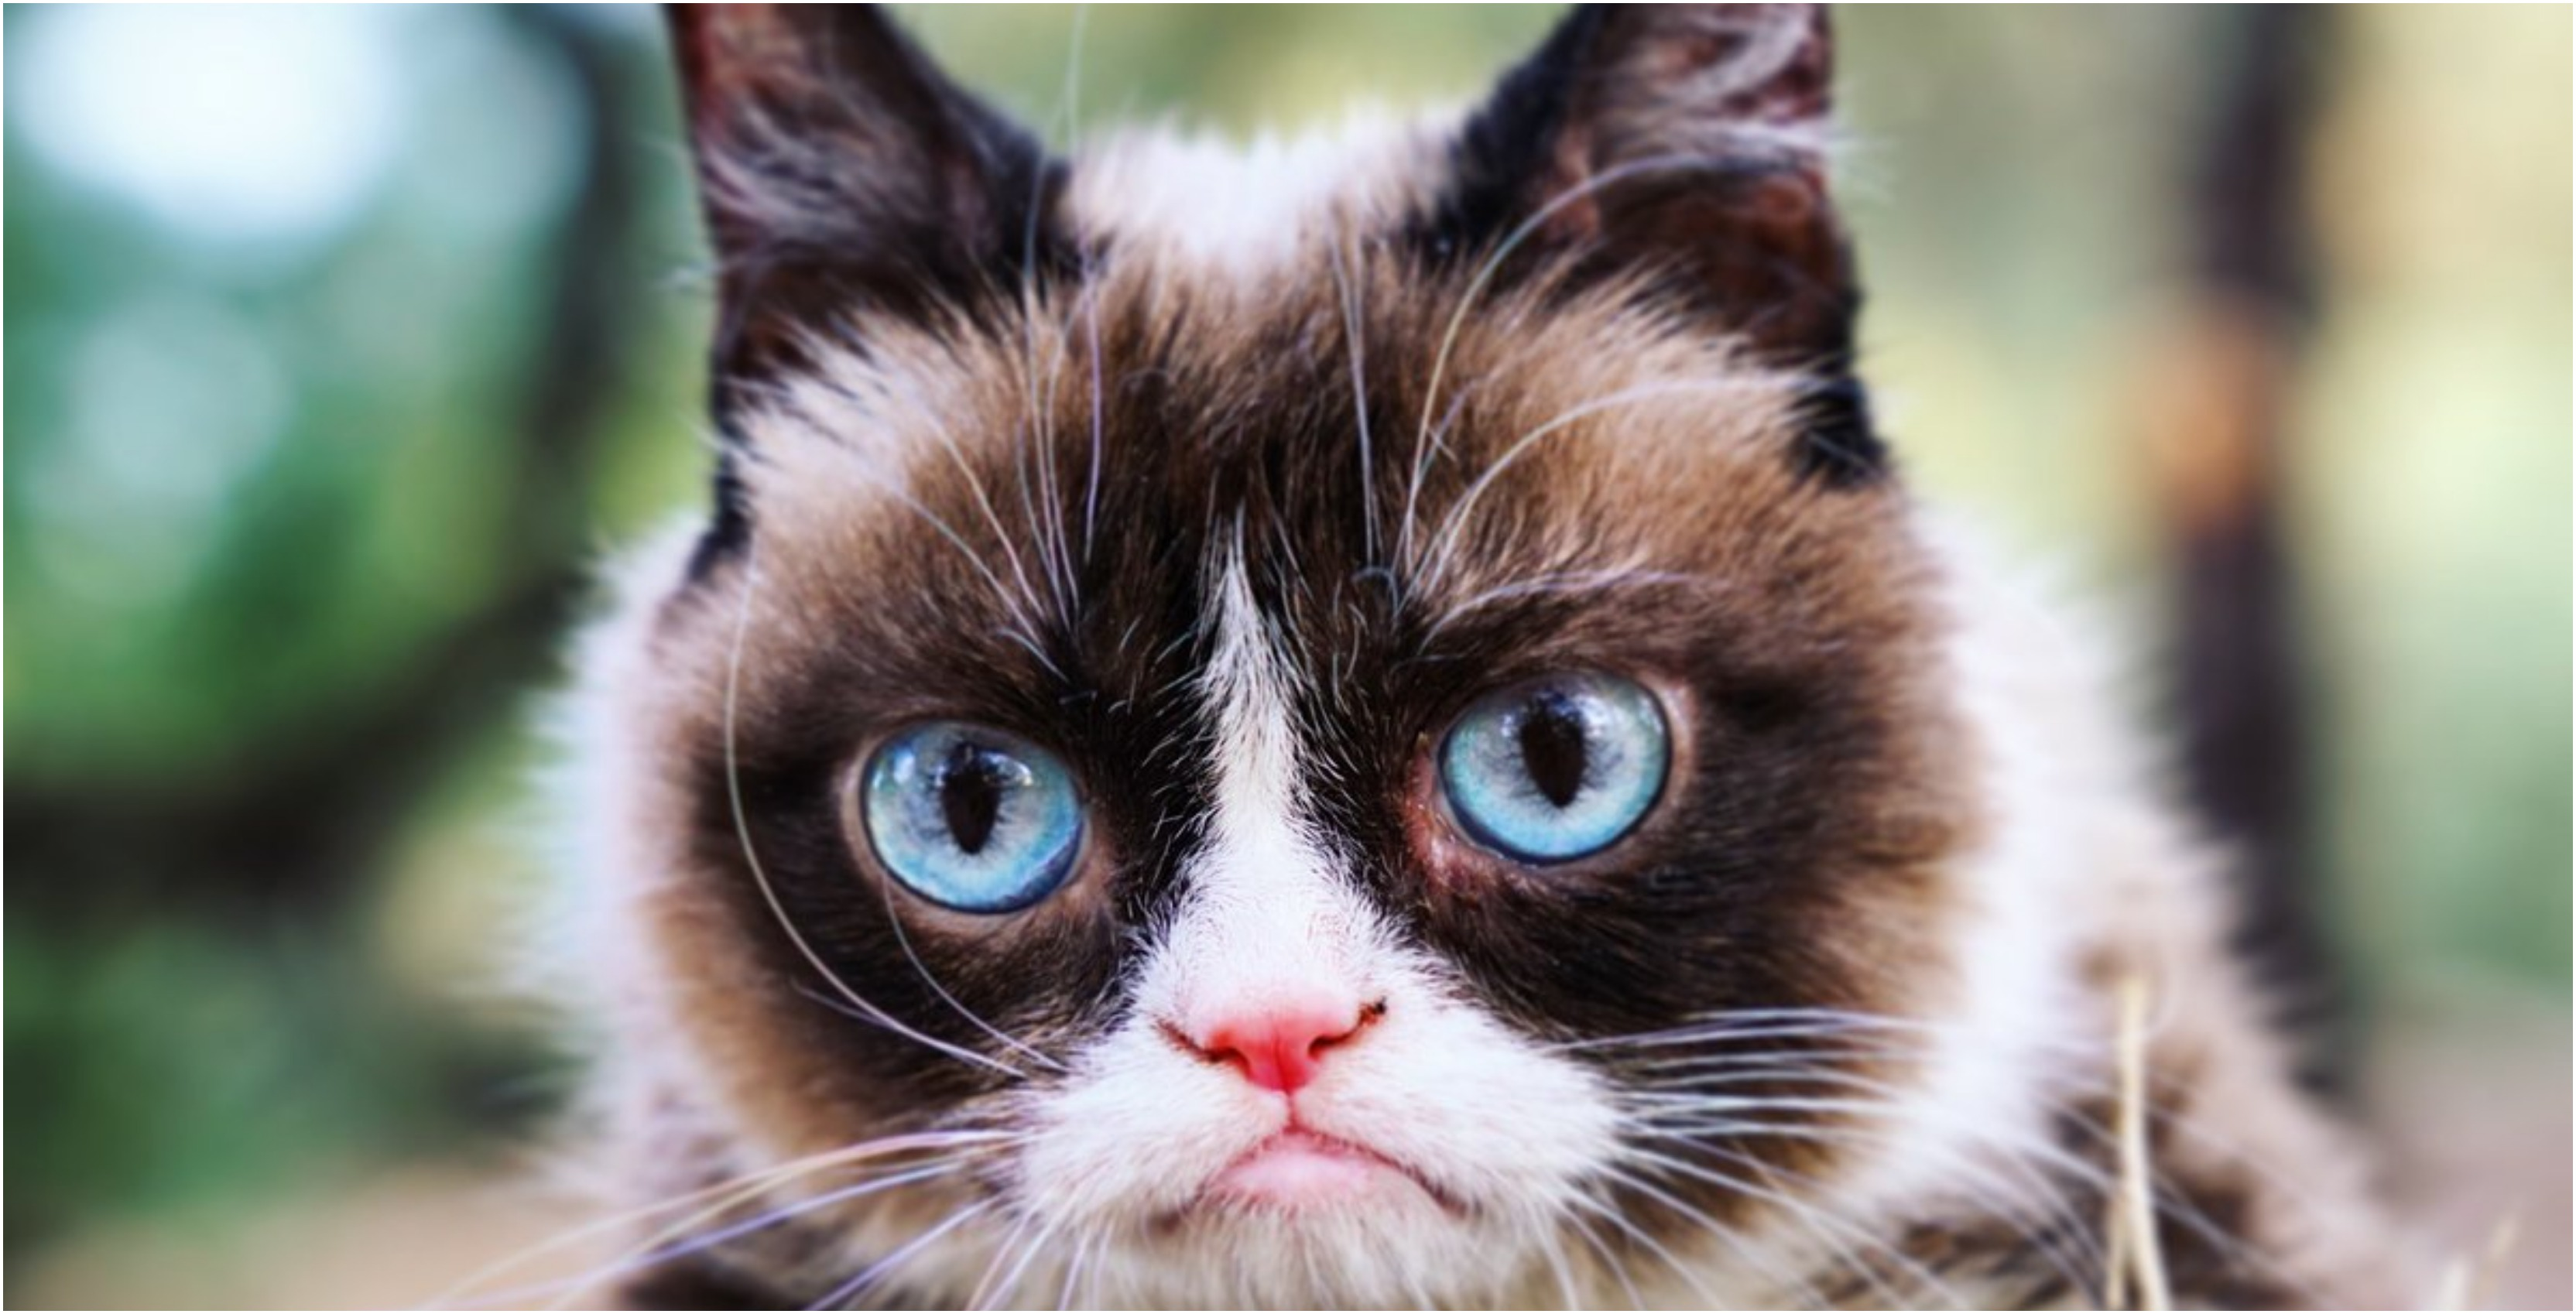 Grumpy Cat, internet meme legend and celebrity, has died